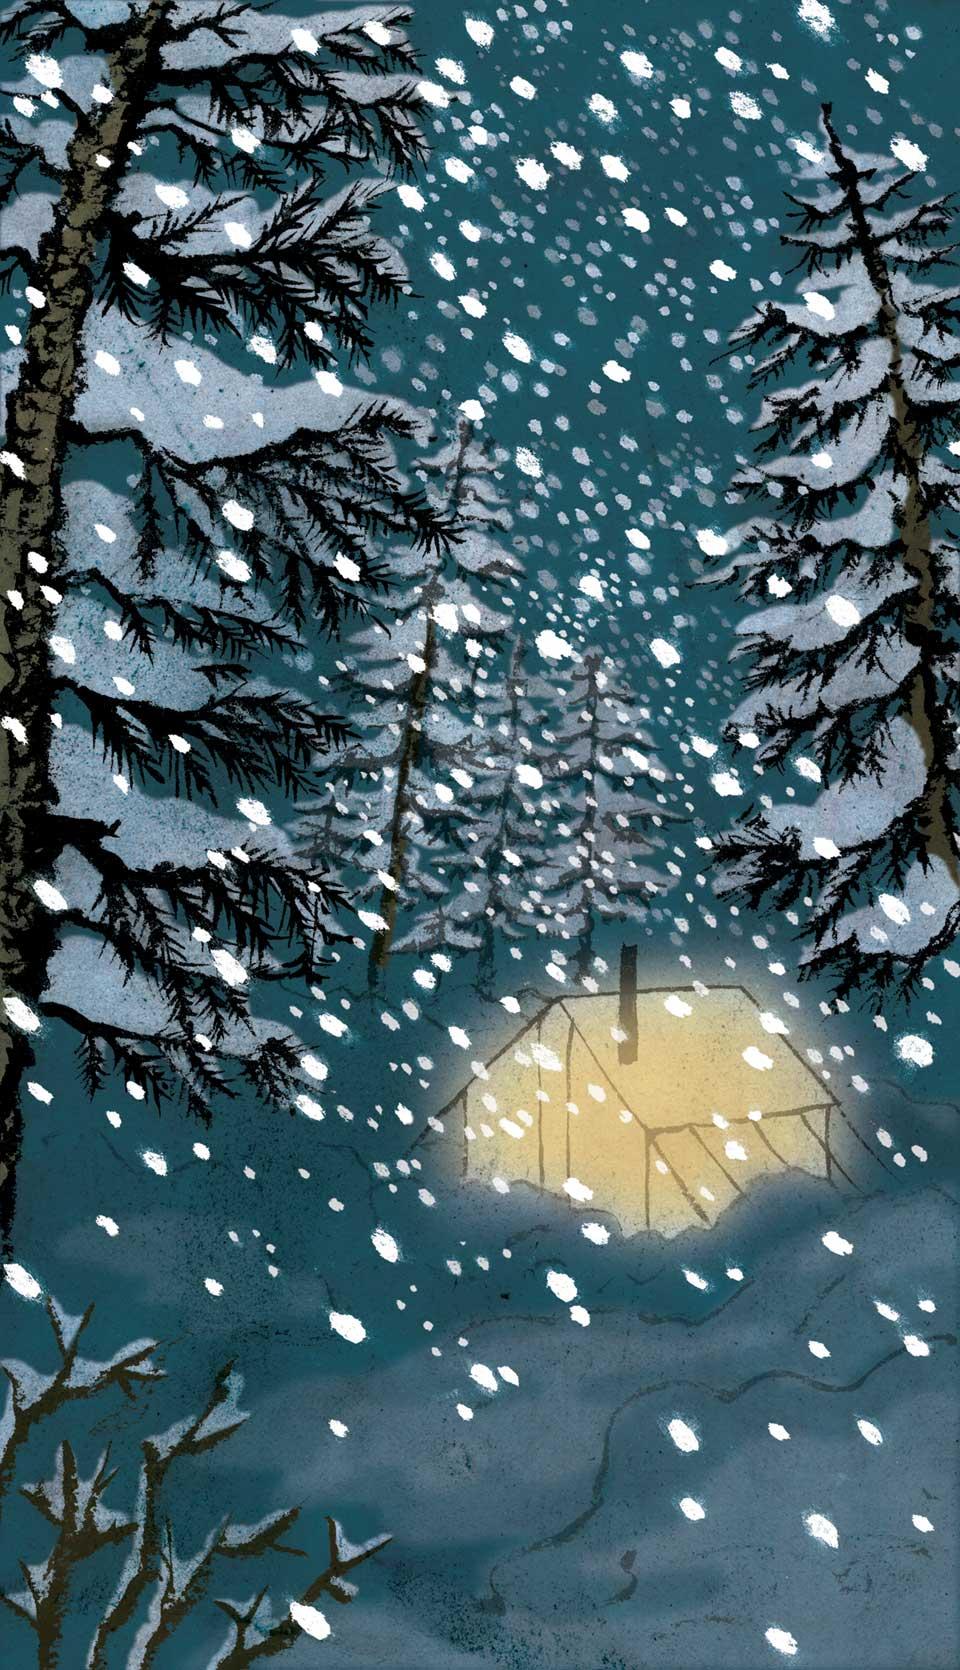 Yuko Shimizu - OUTDOOR LIFE Snowbound! -